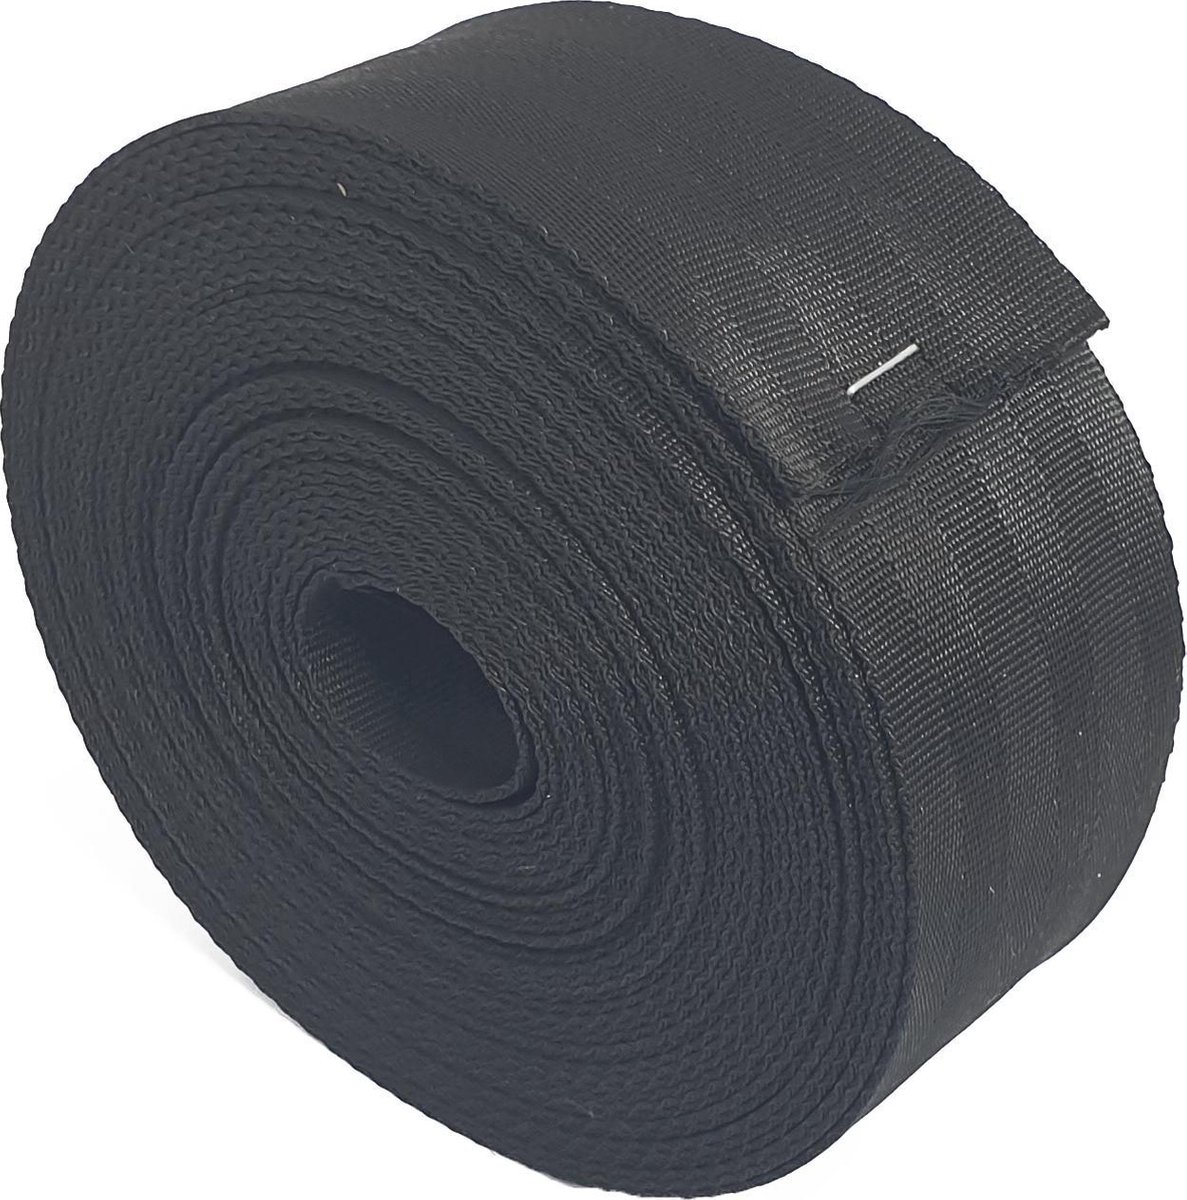 10 mtr -Boomband - Gordelband - 50 mm - zwart - autogordel